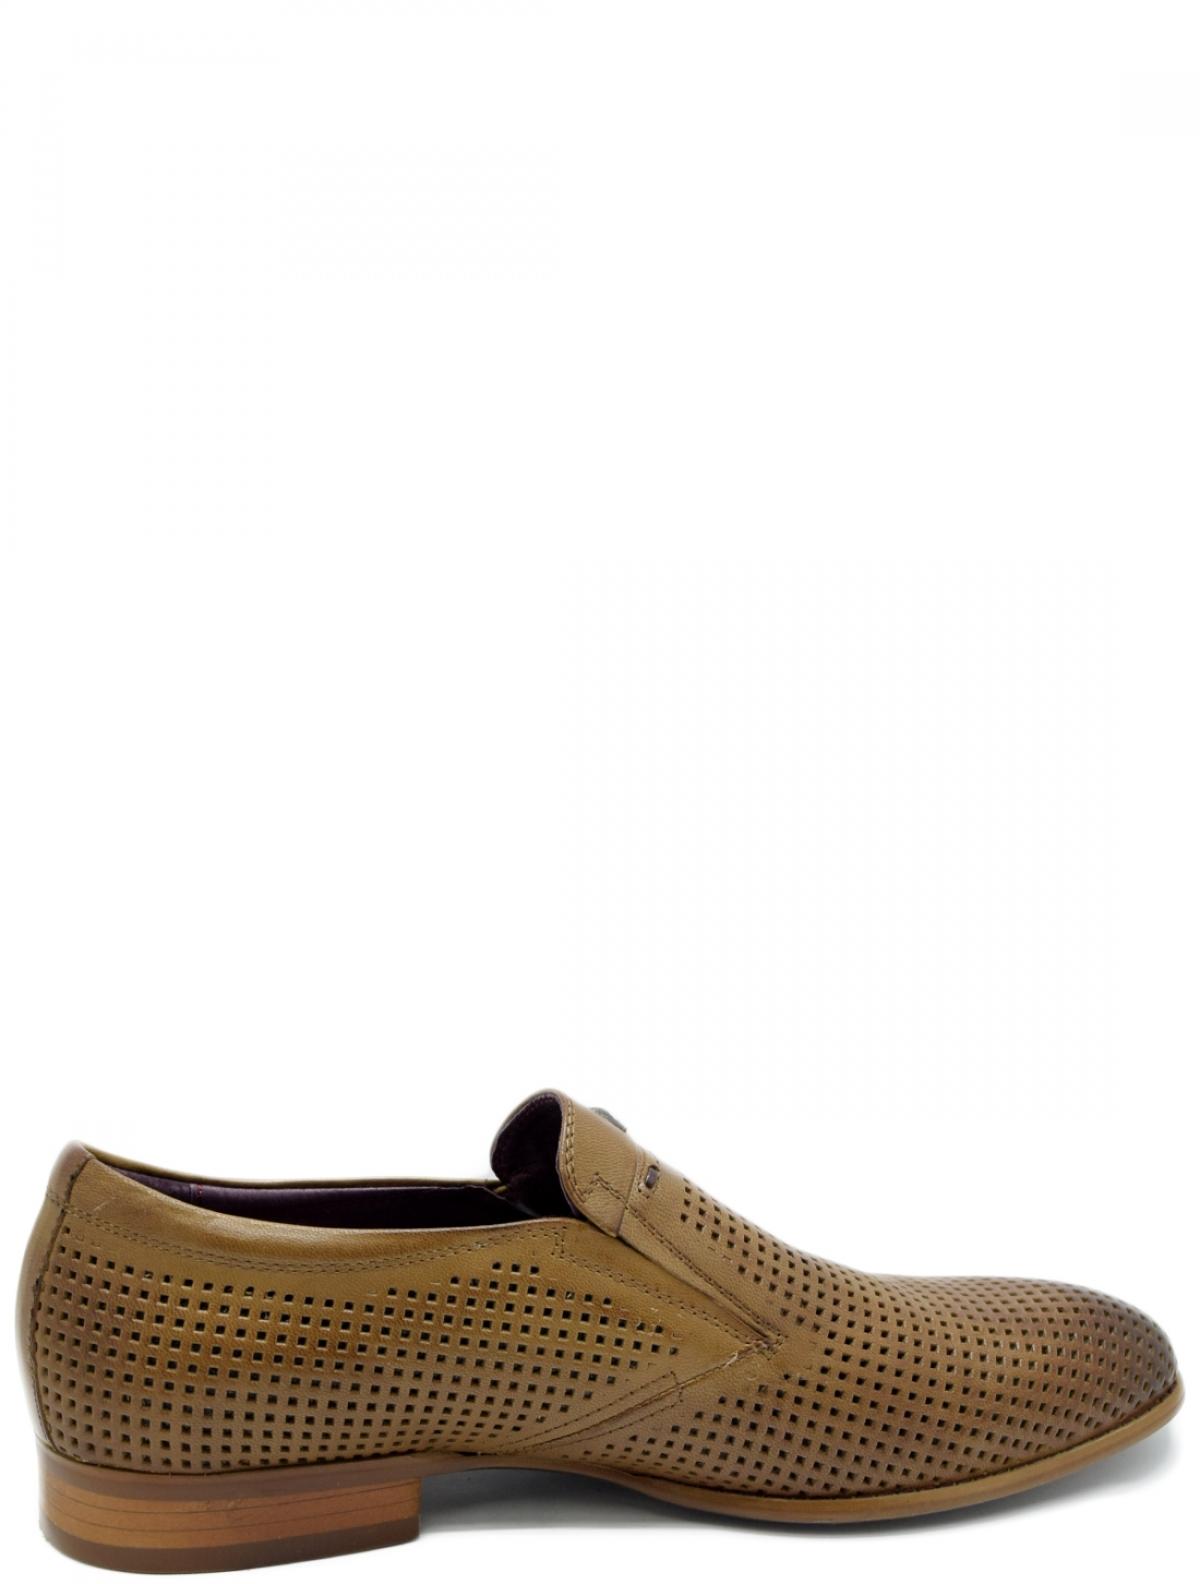 Rosconi R507D67YC-004-G-6729C мужские туфли